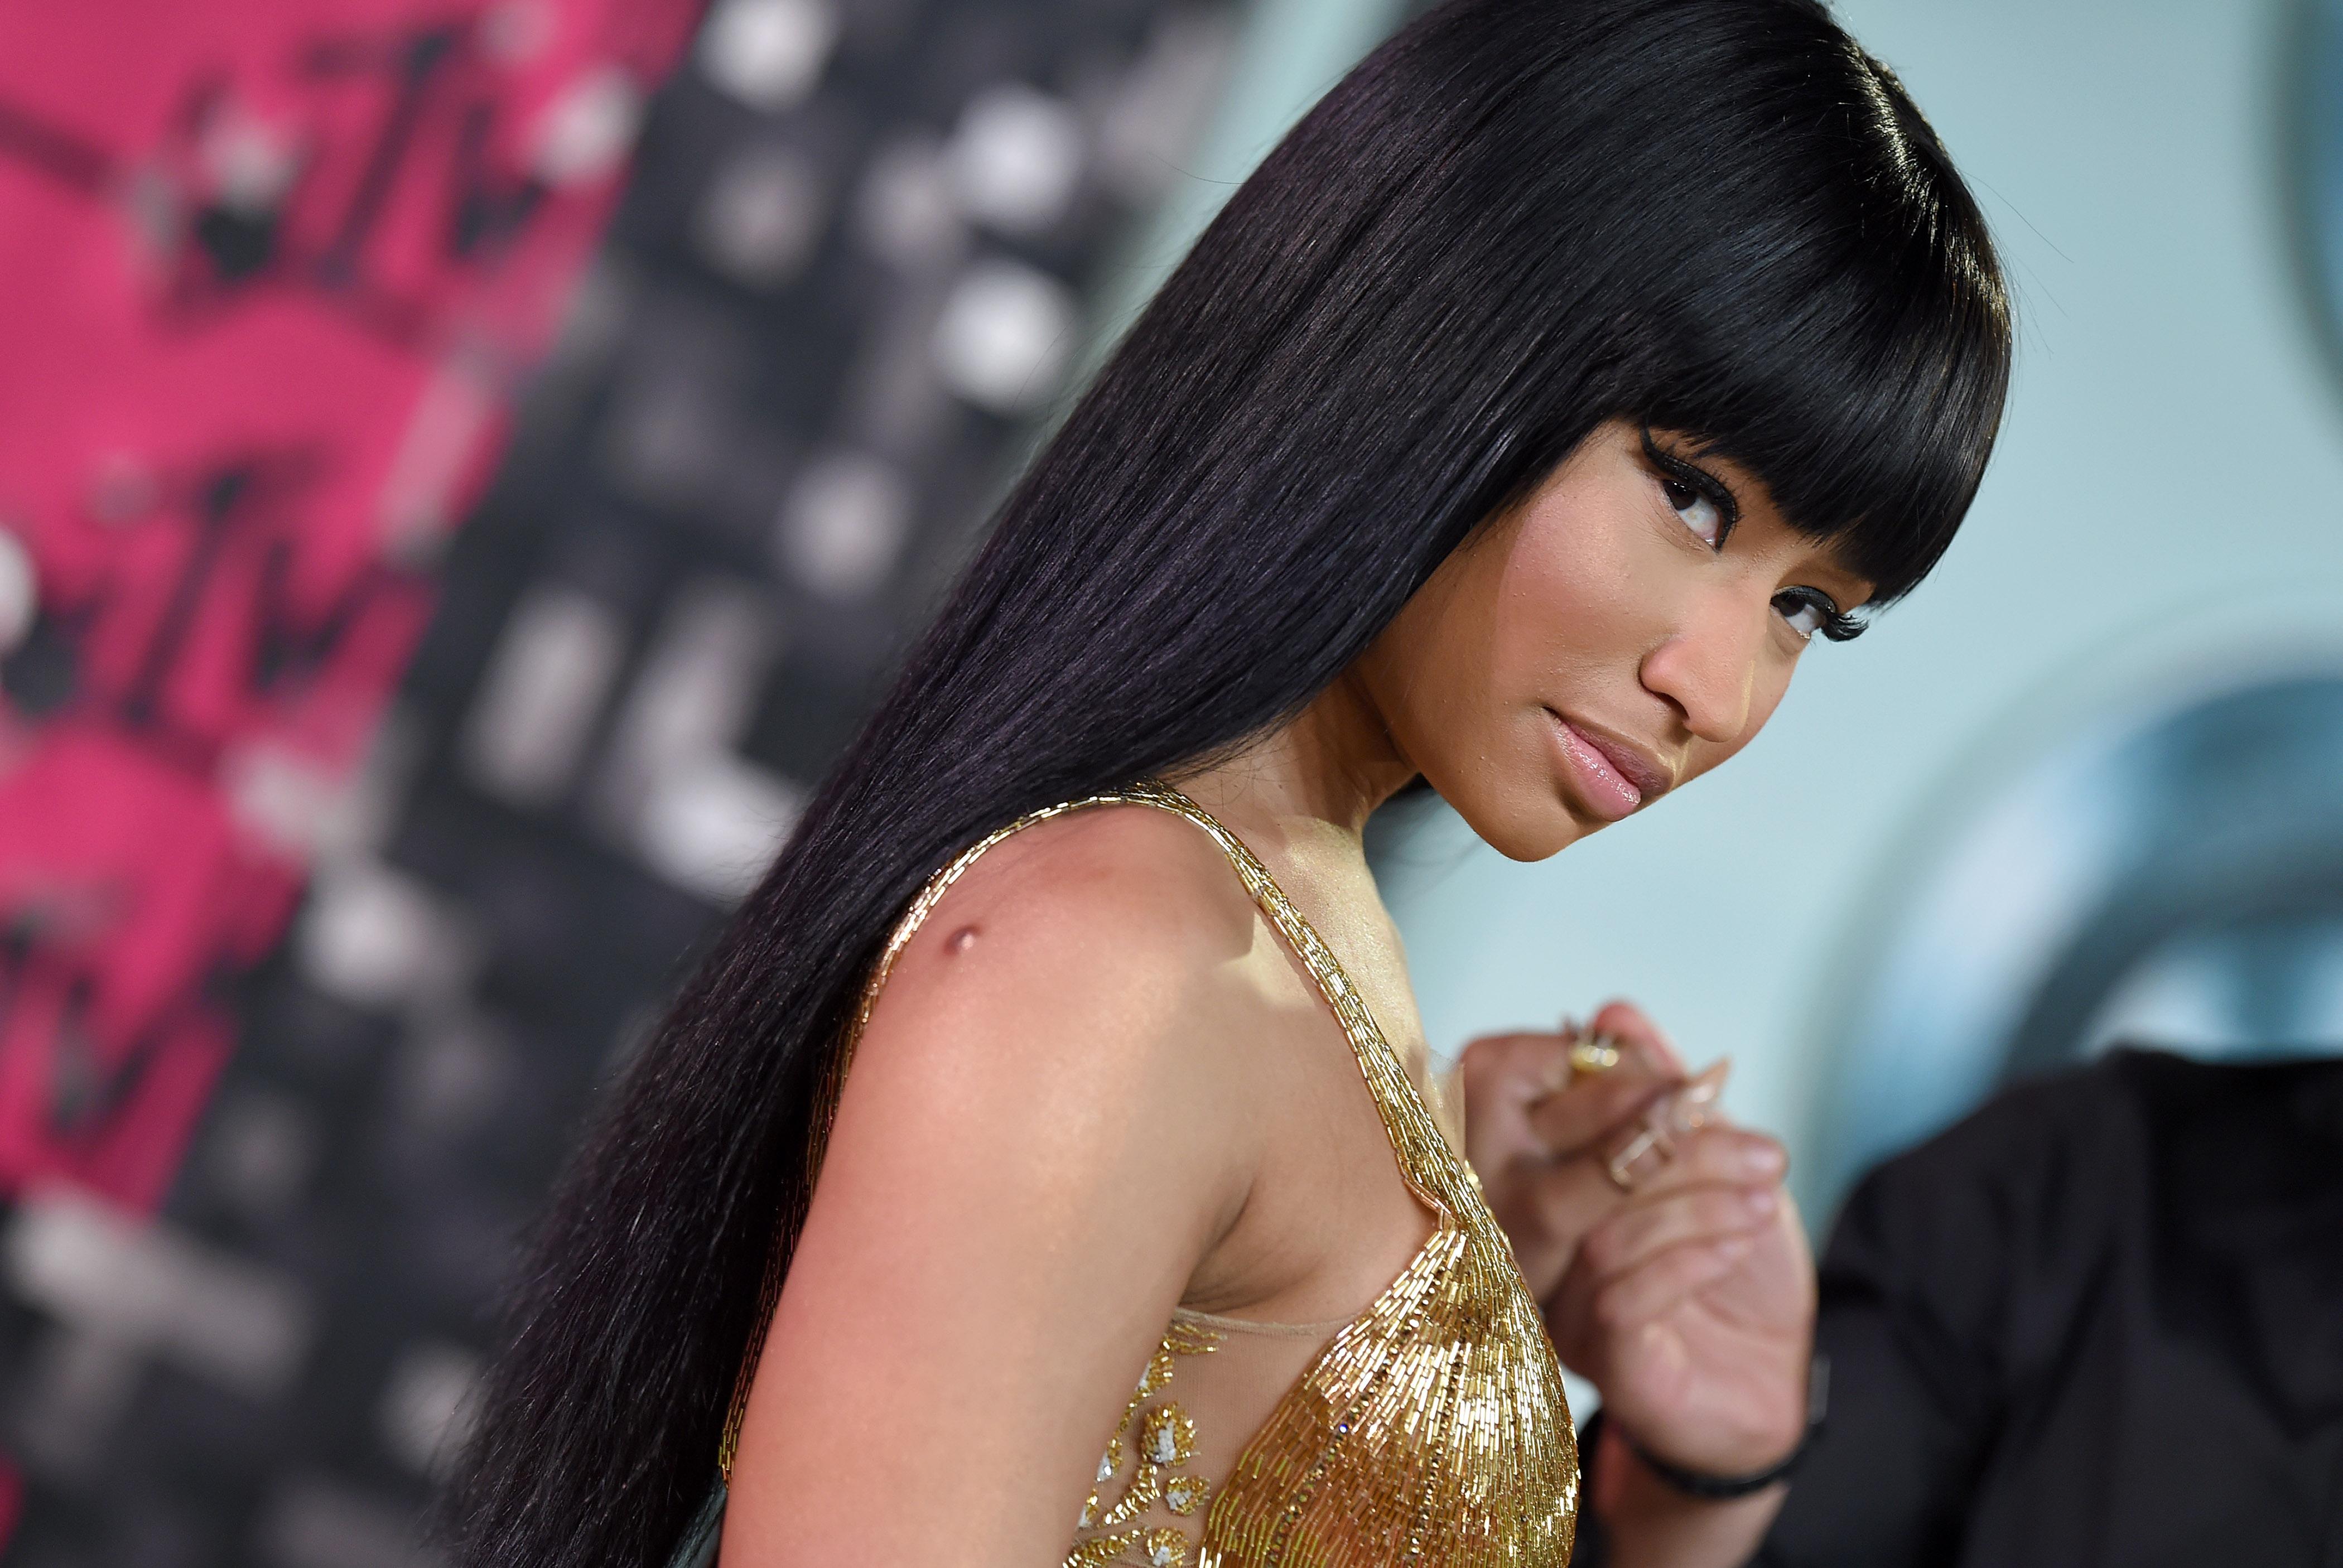 Nicki Minaj Sex Tape Hits The Net | Foxy 107.1-104.3